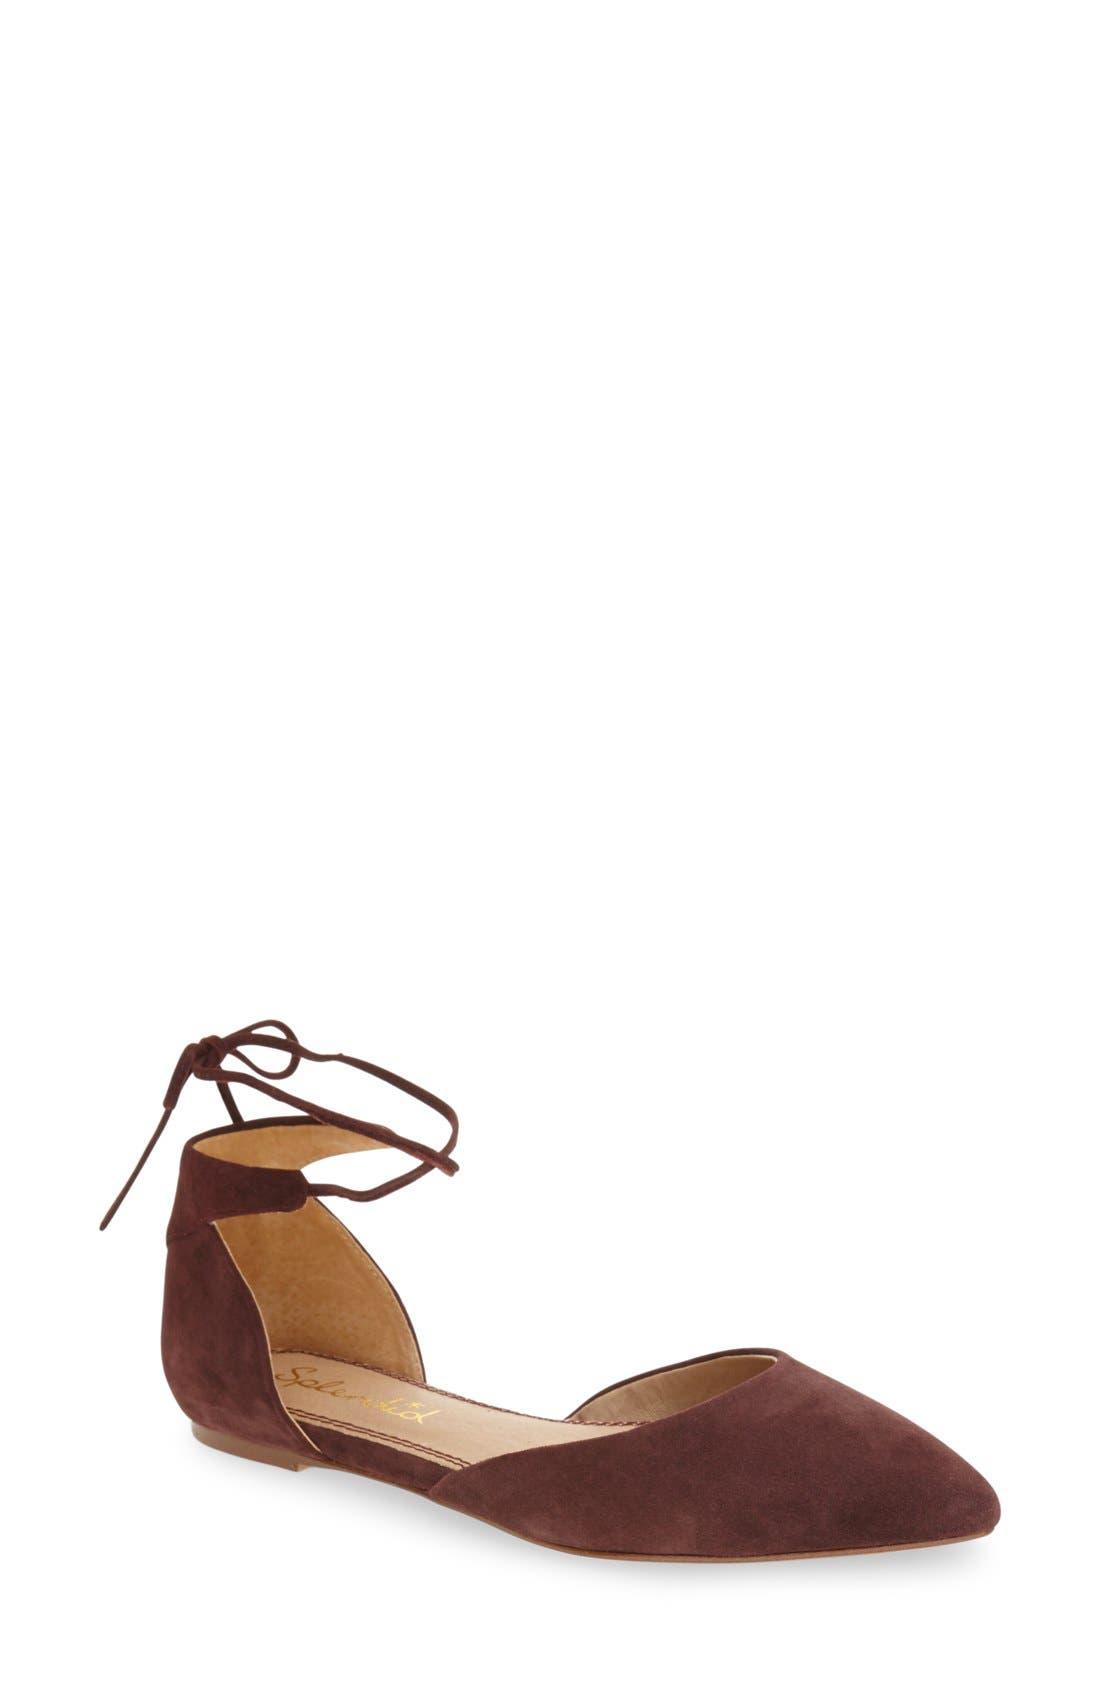 Alternate Image 1 Selected - Splendid 'Annabelle' Lace-Up d'Orsay Flat (Women)